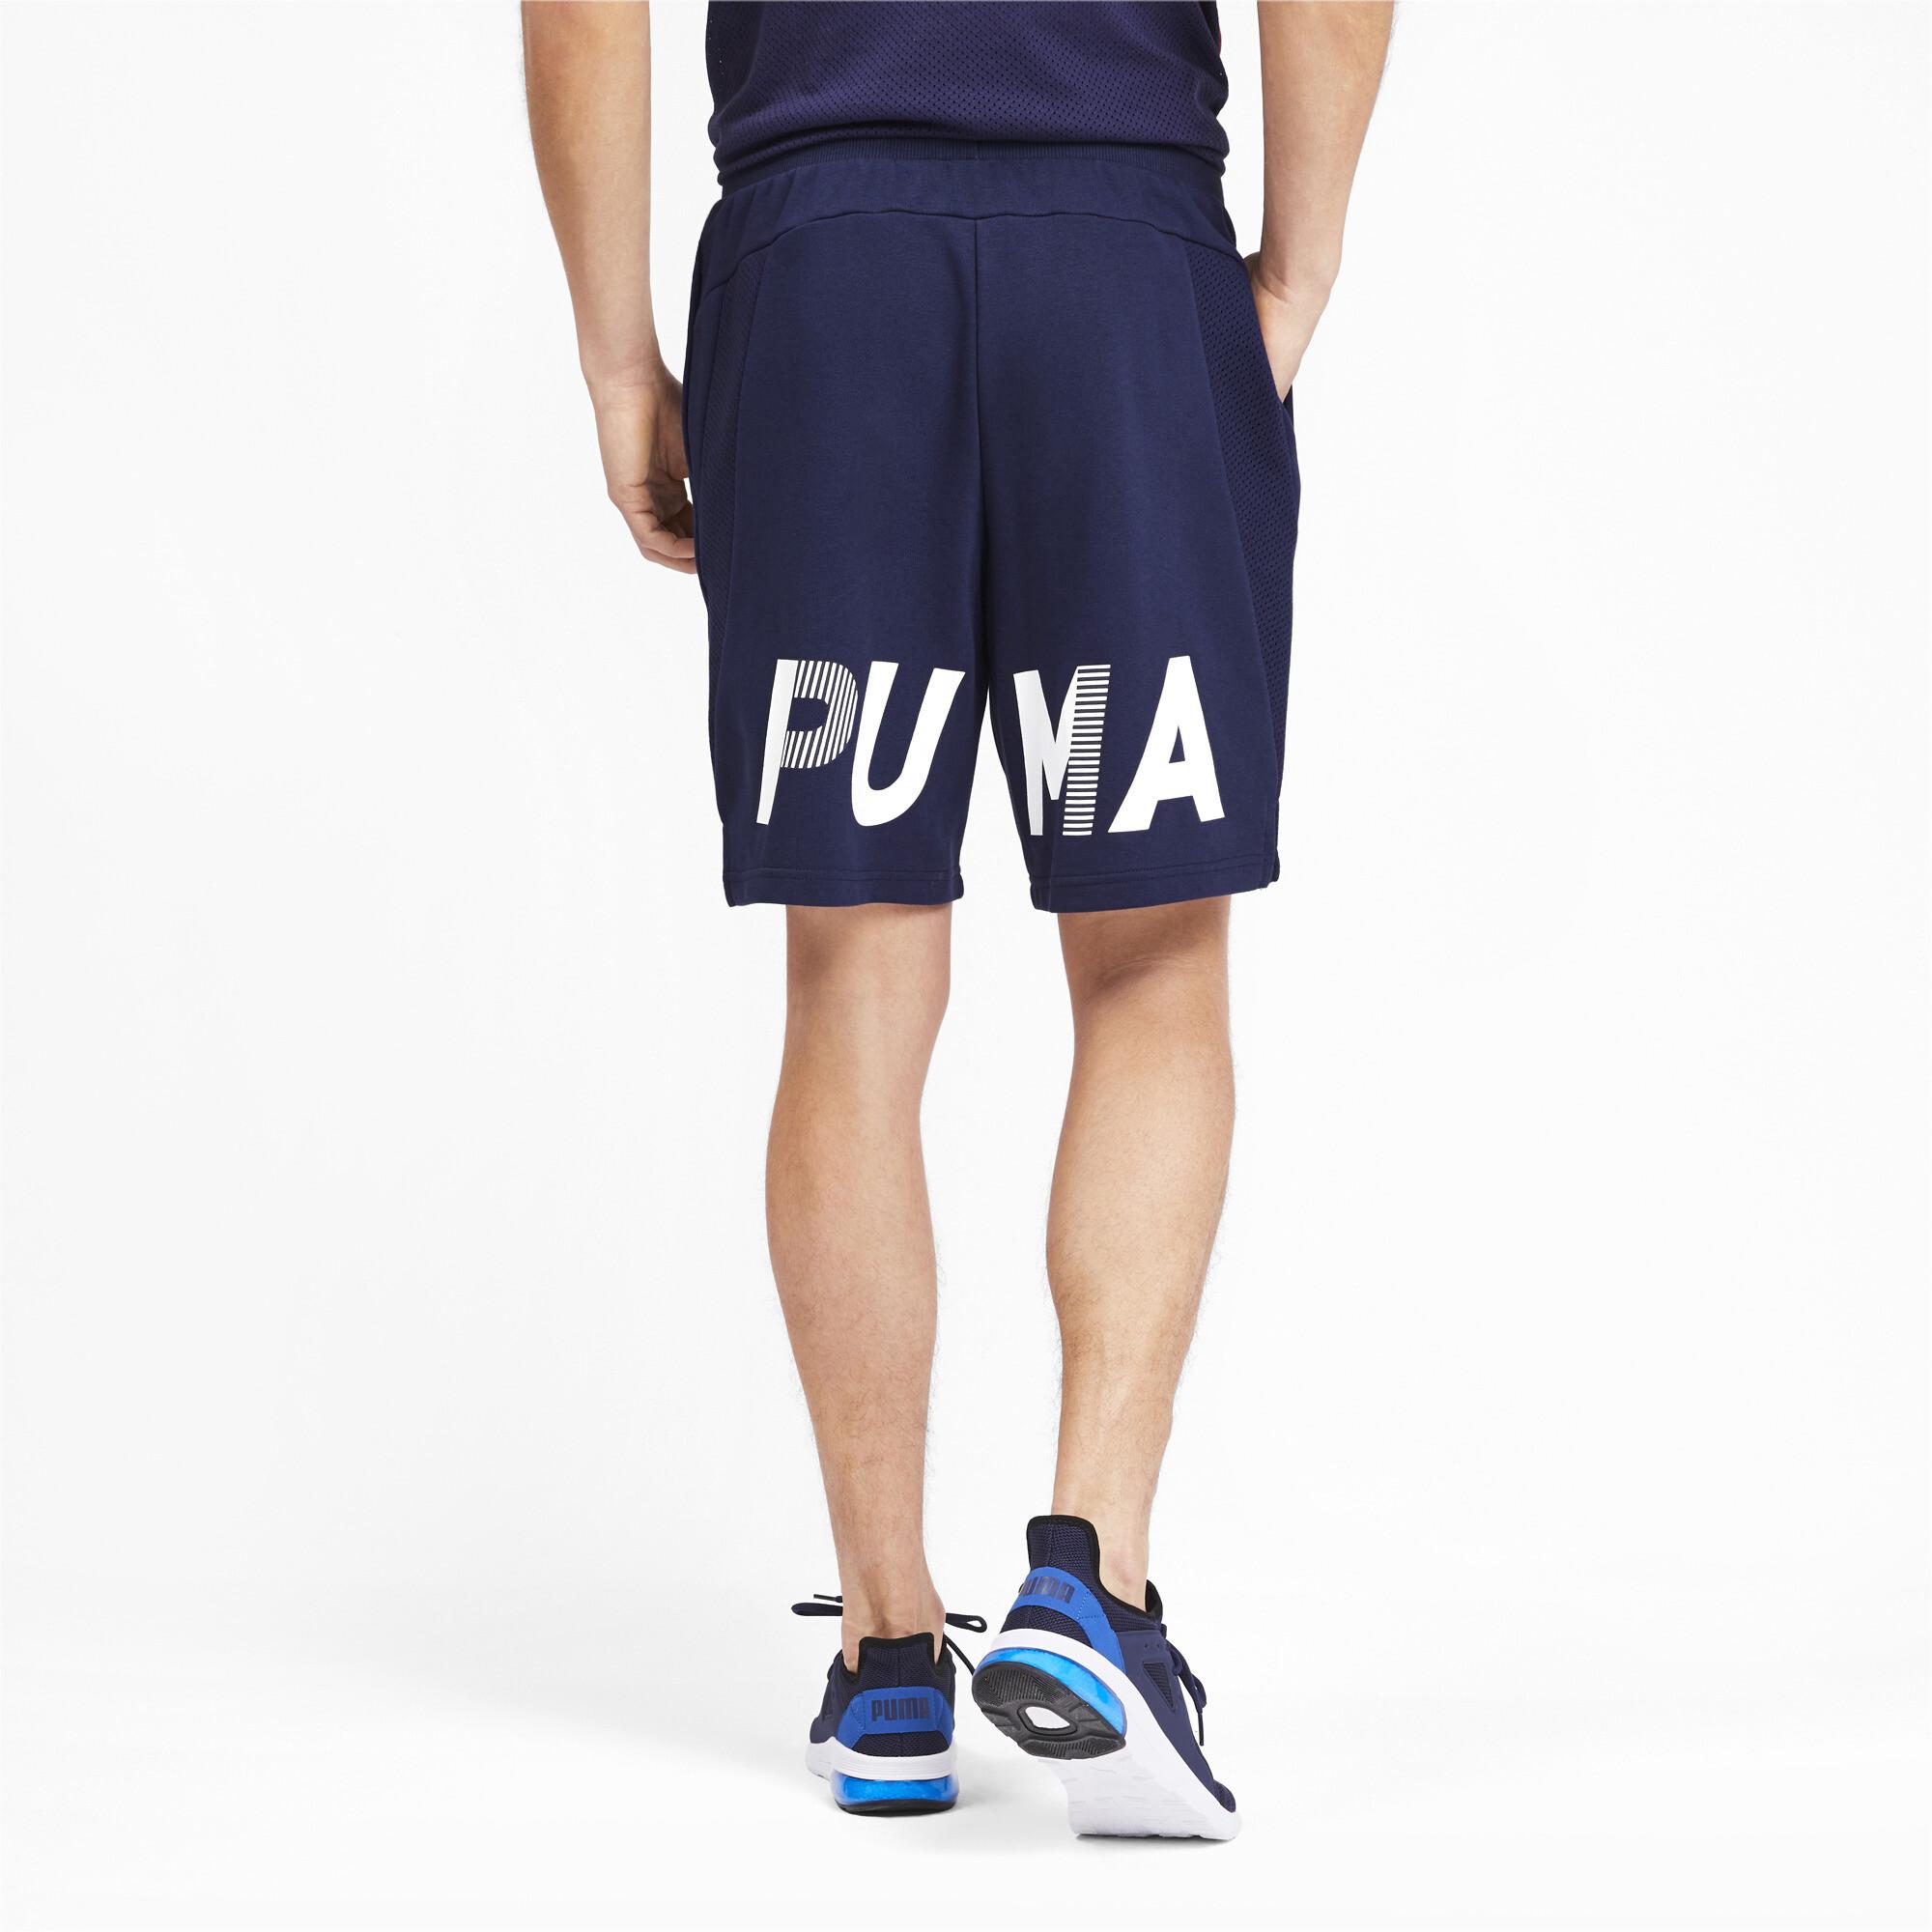 PUMA-Modern-Sports-Men-039-s-Shorts-Men-Knitted-Shorts-Basics thumbnail 15